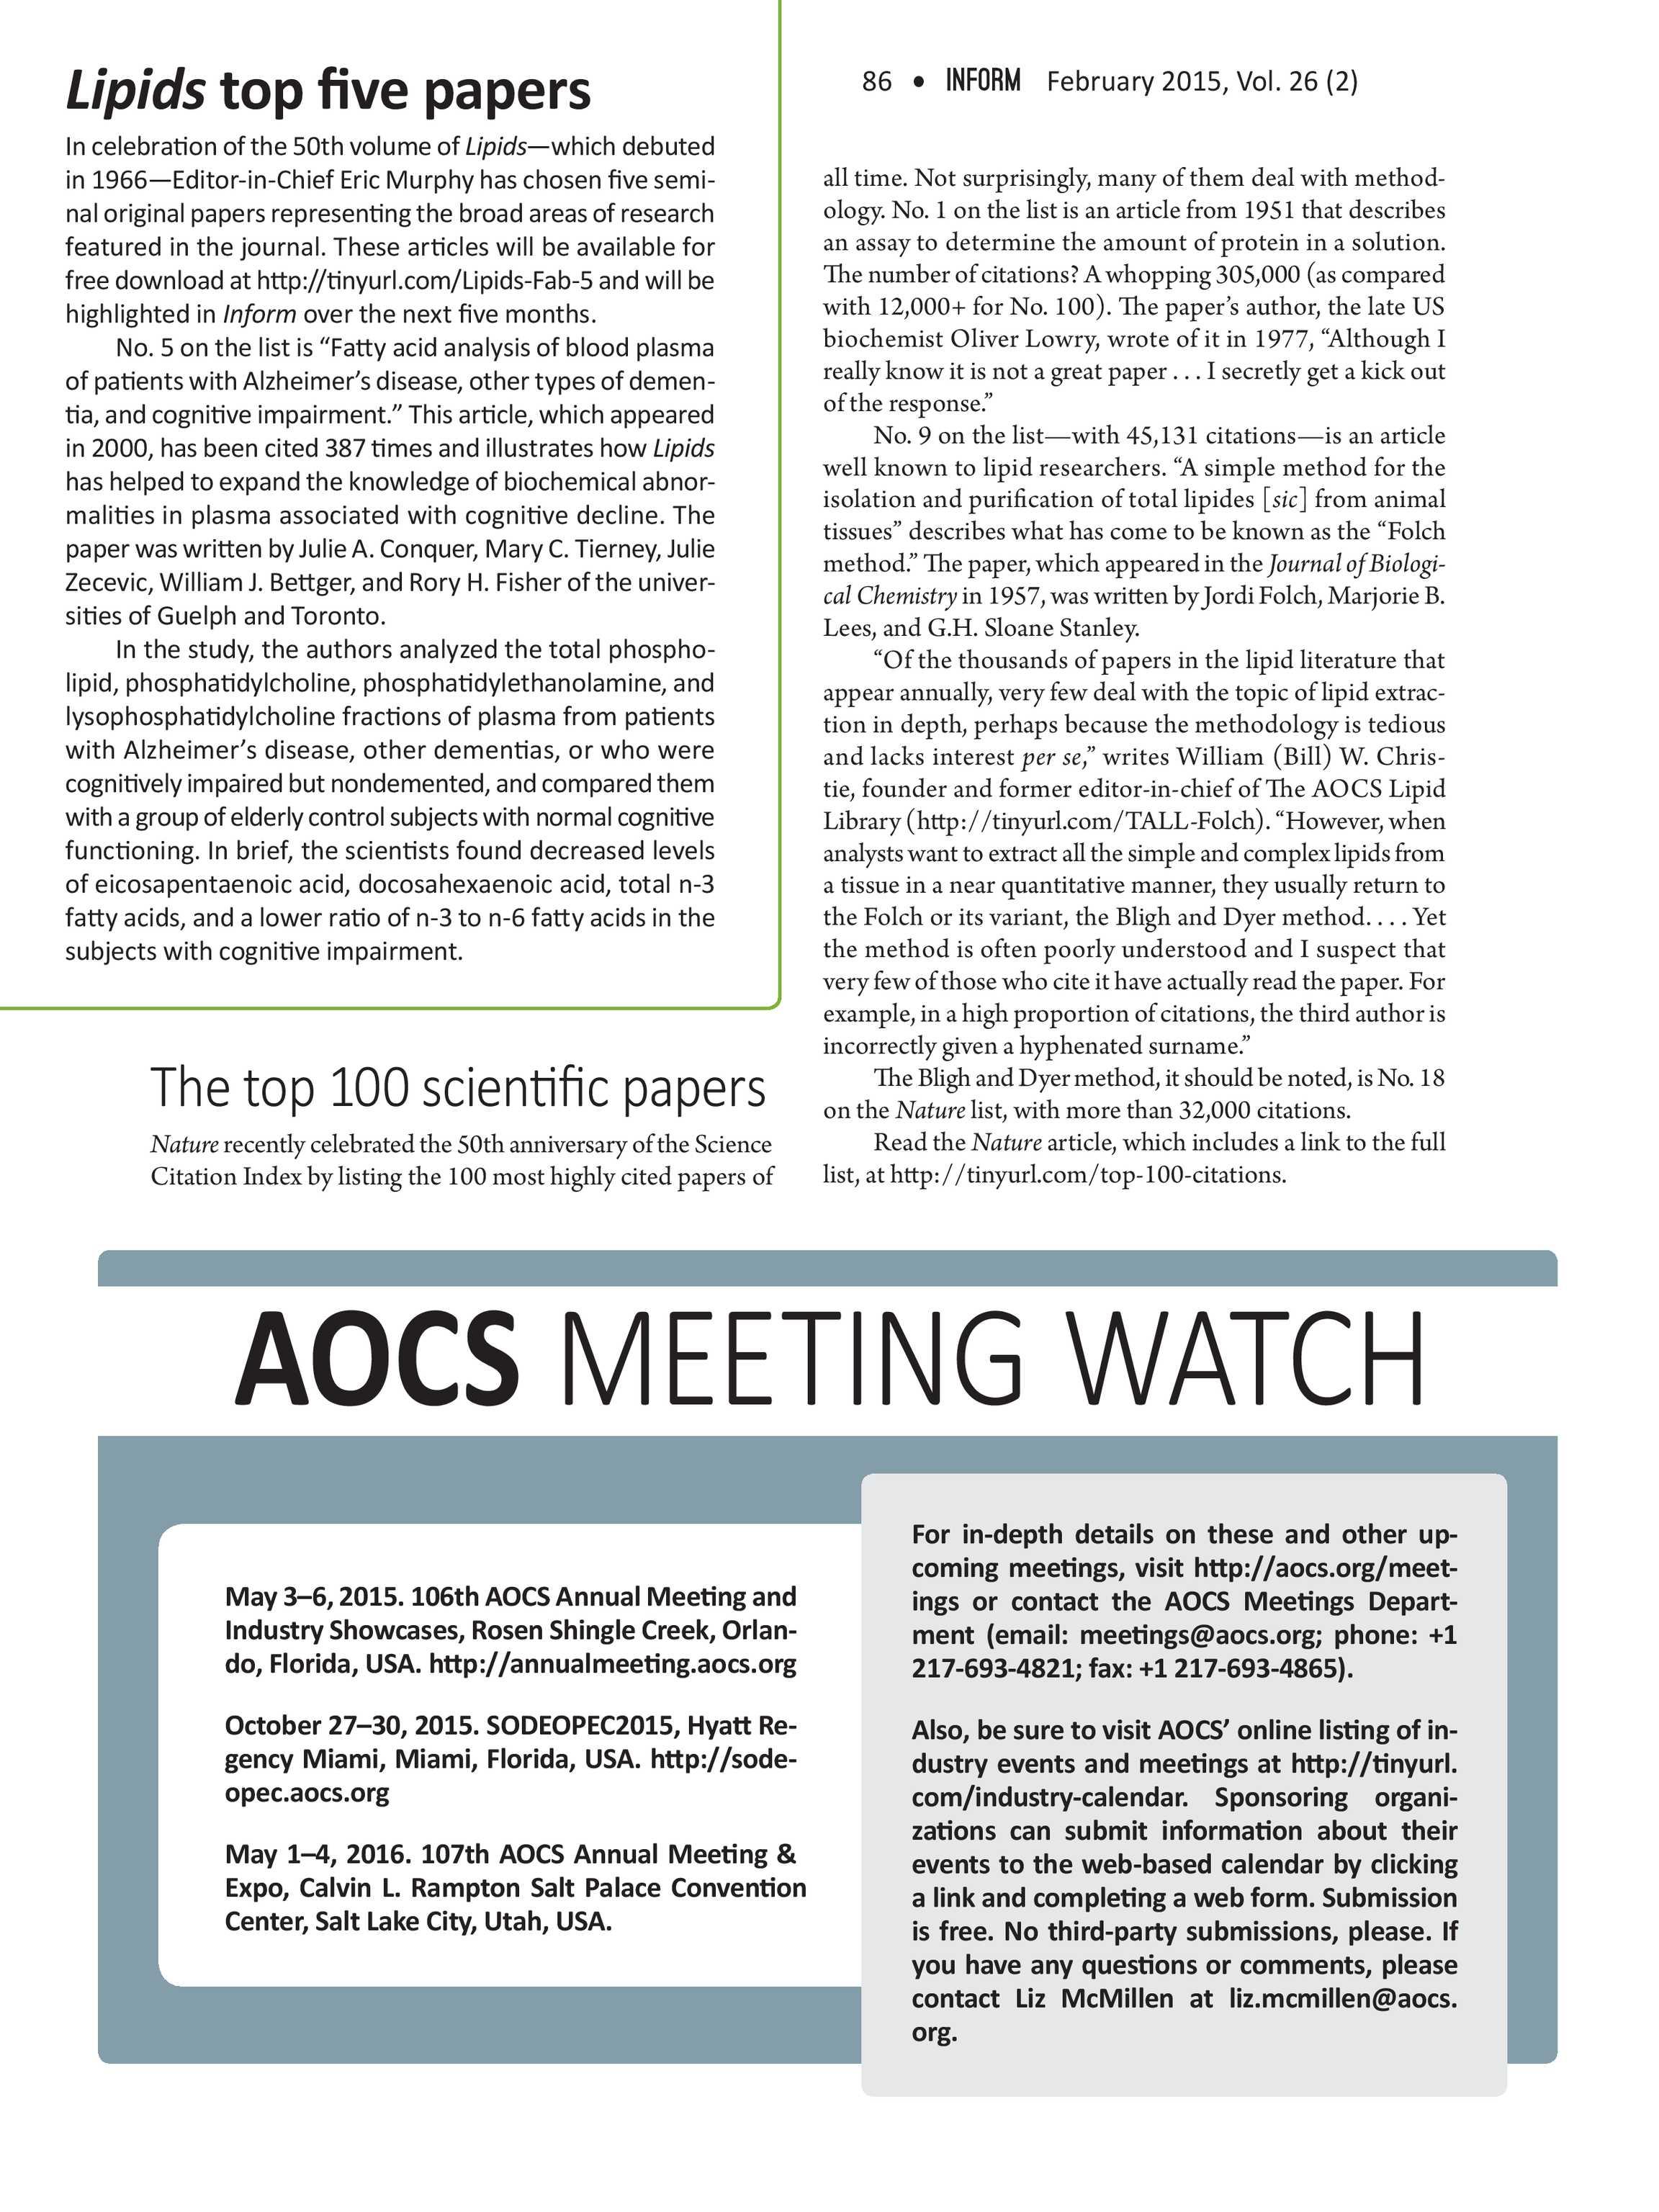 Inform Magazine - February 2015 - page 86